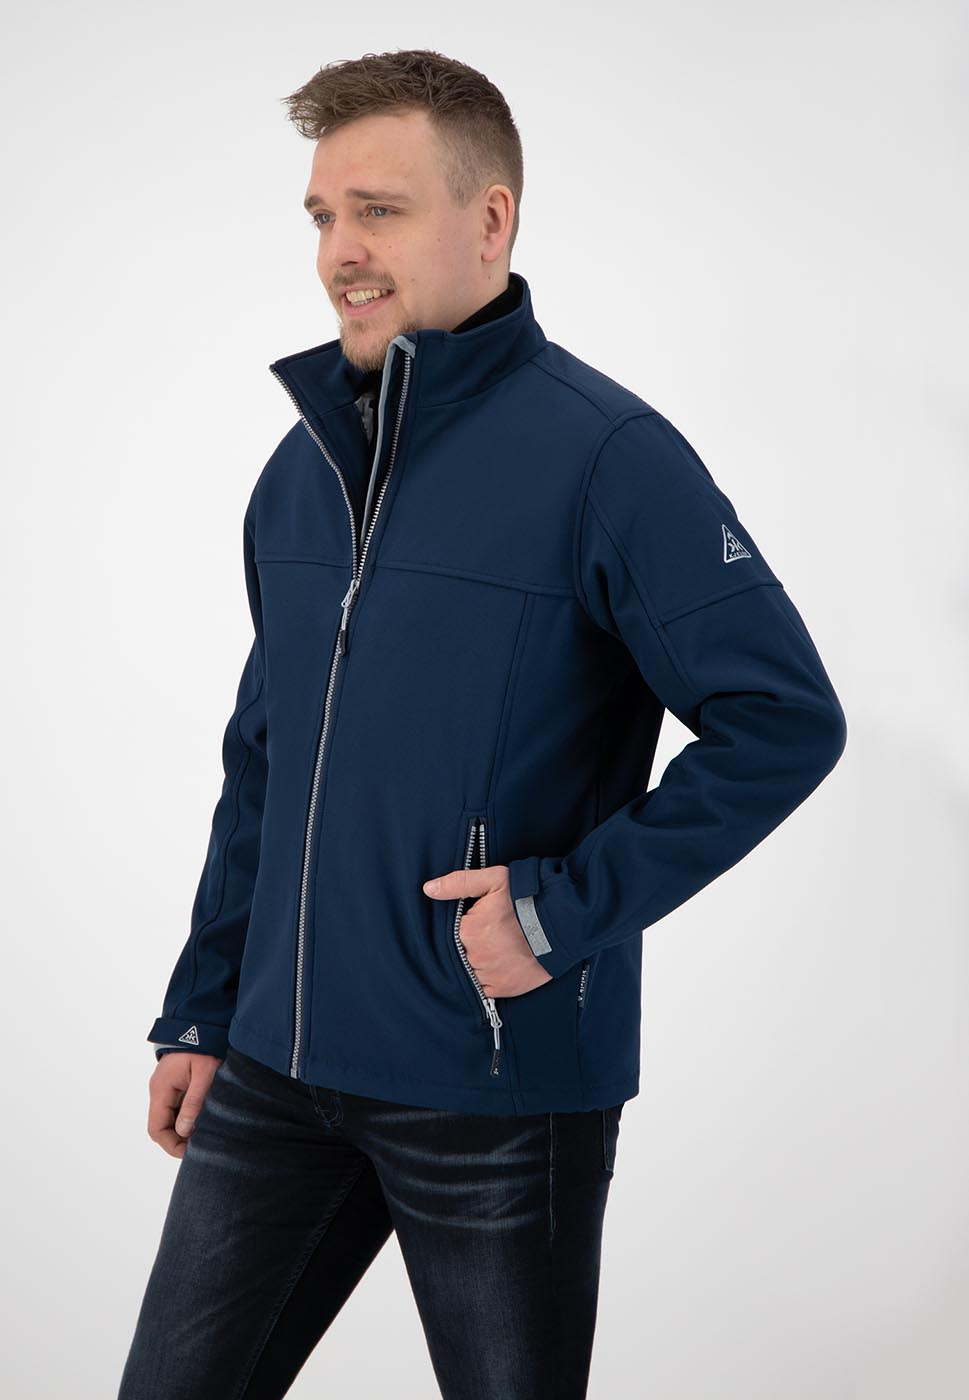 Kjelvik Scandinavian Clothing - Men Softshell Odense Navy